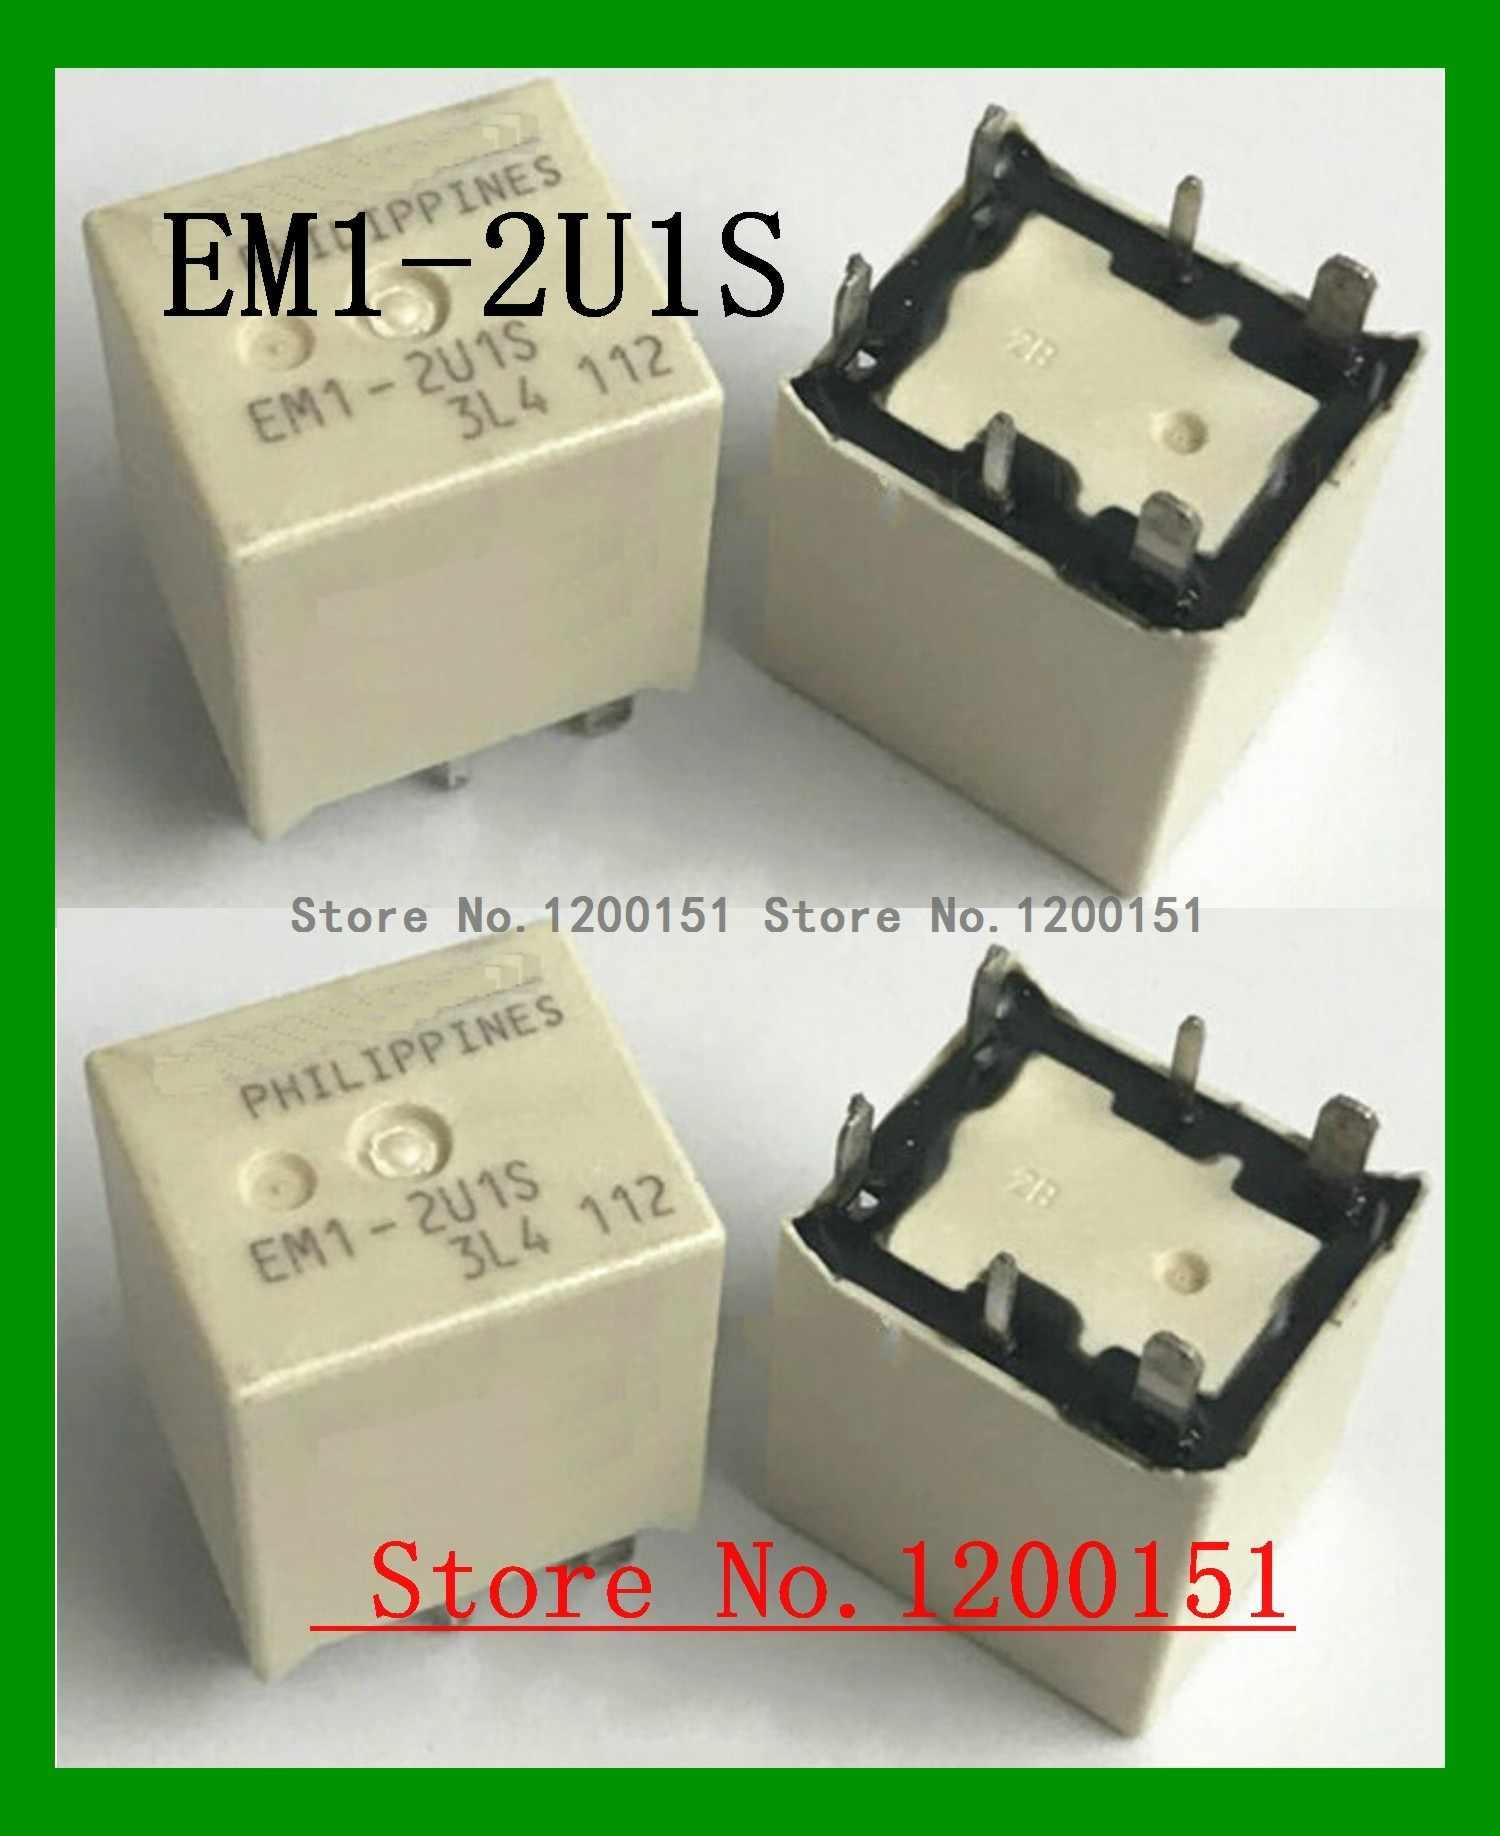 CP1-12V ACP131 EM1-2U1 EM1-2U1S EN2-B1N1S EP1F-B3G1S EP2R-B3G1T ET1-B3M1S ET2F-N3 EX1-1F1J EX1-N6